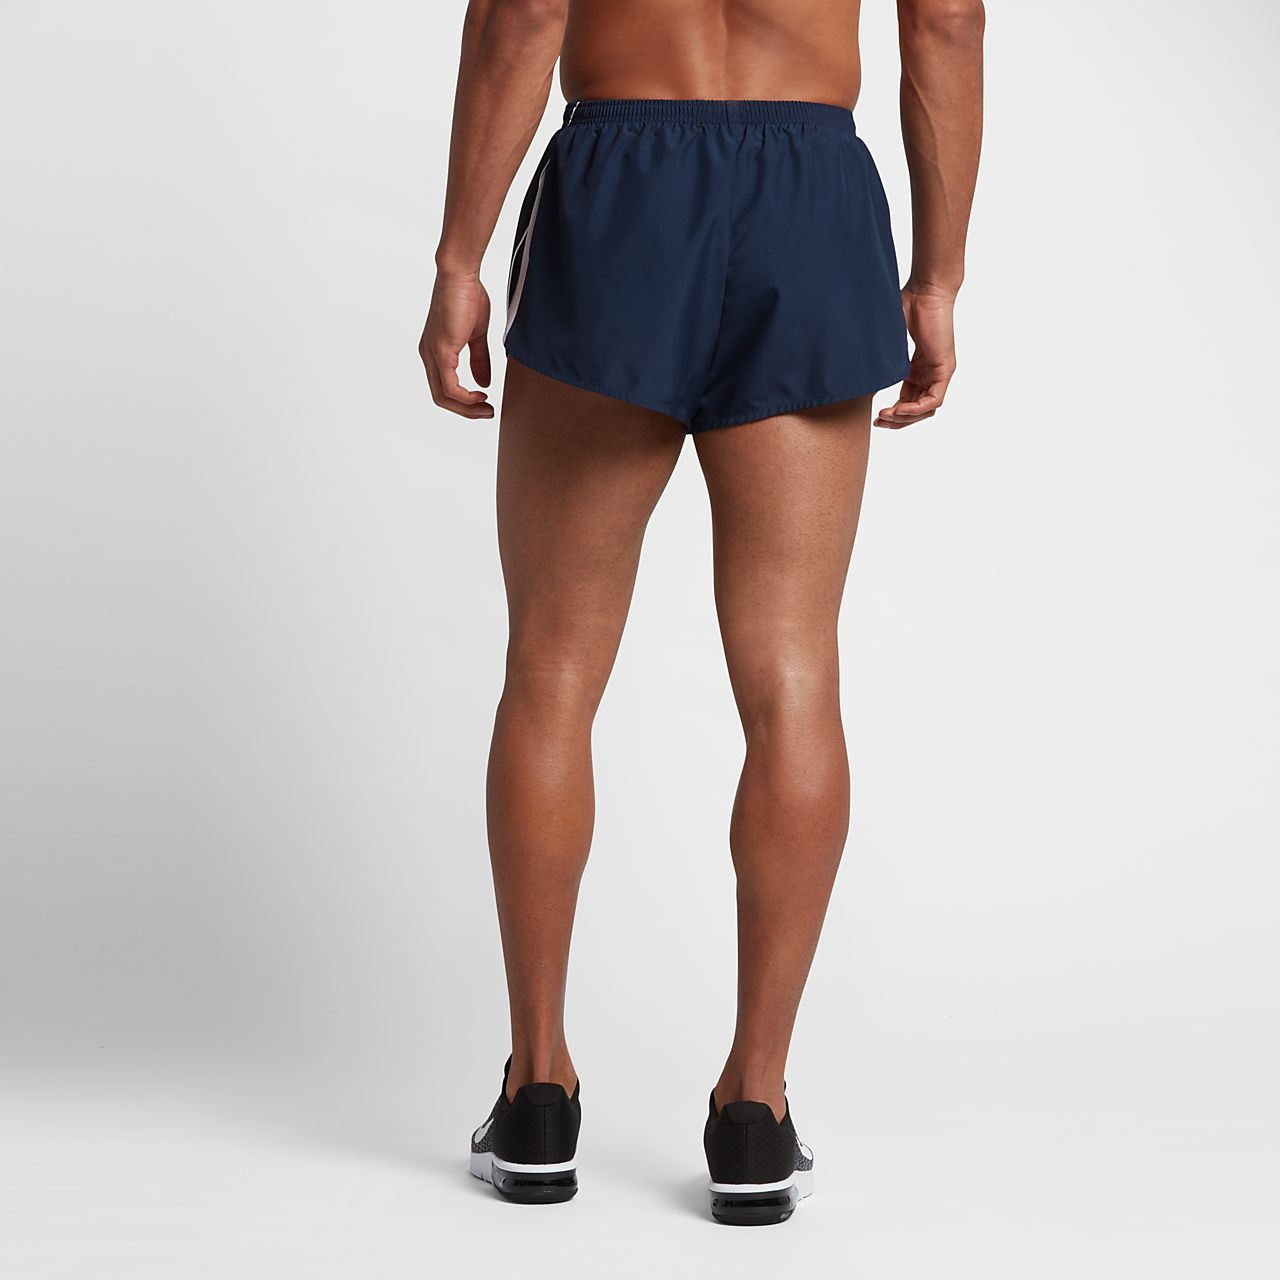 2 inch shorts